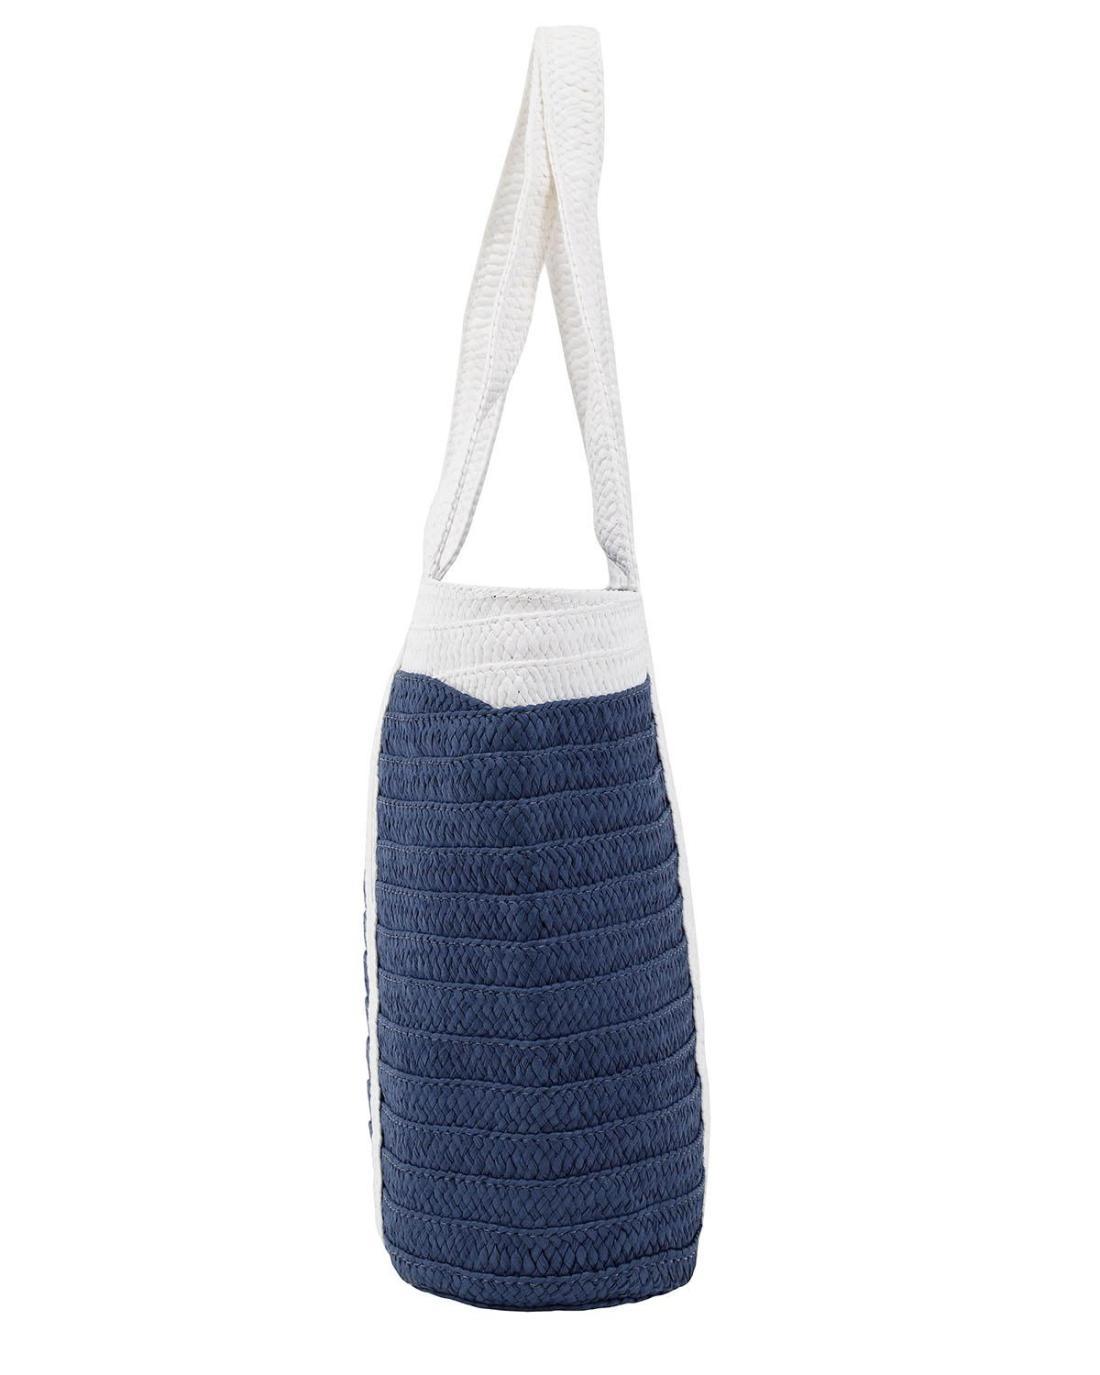 Papierstroh blaue strandtasche